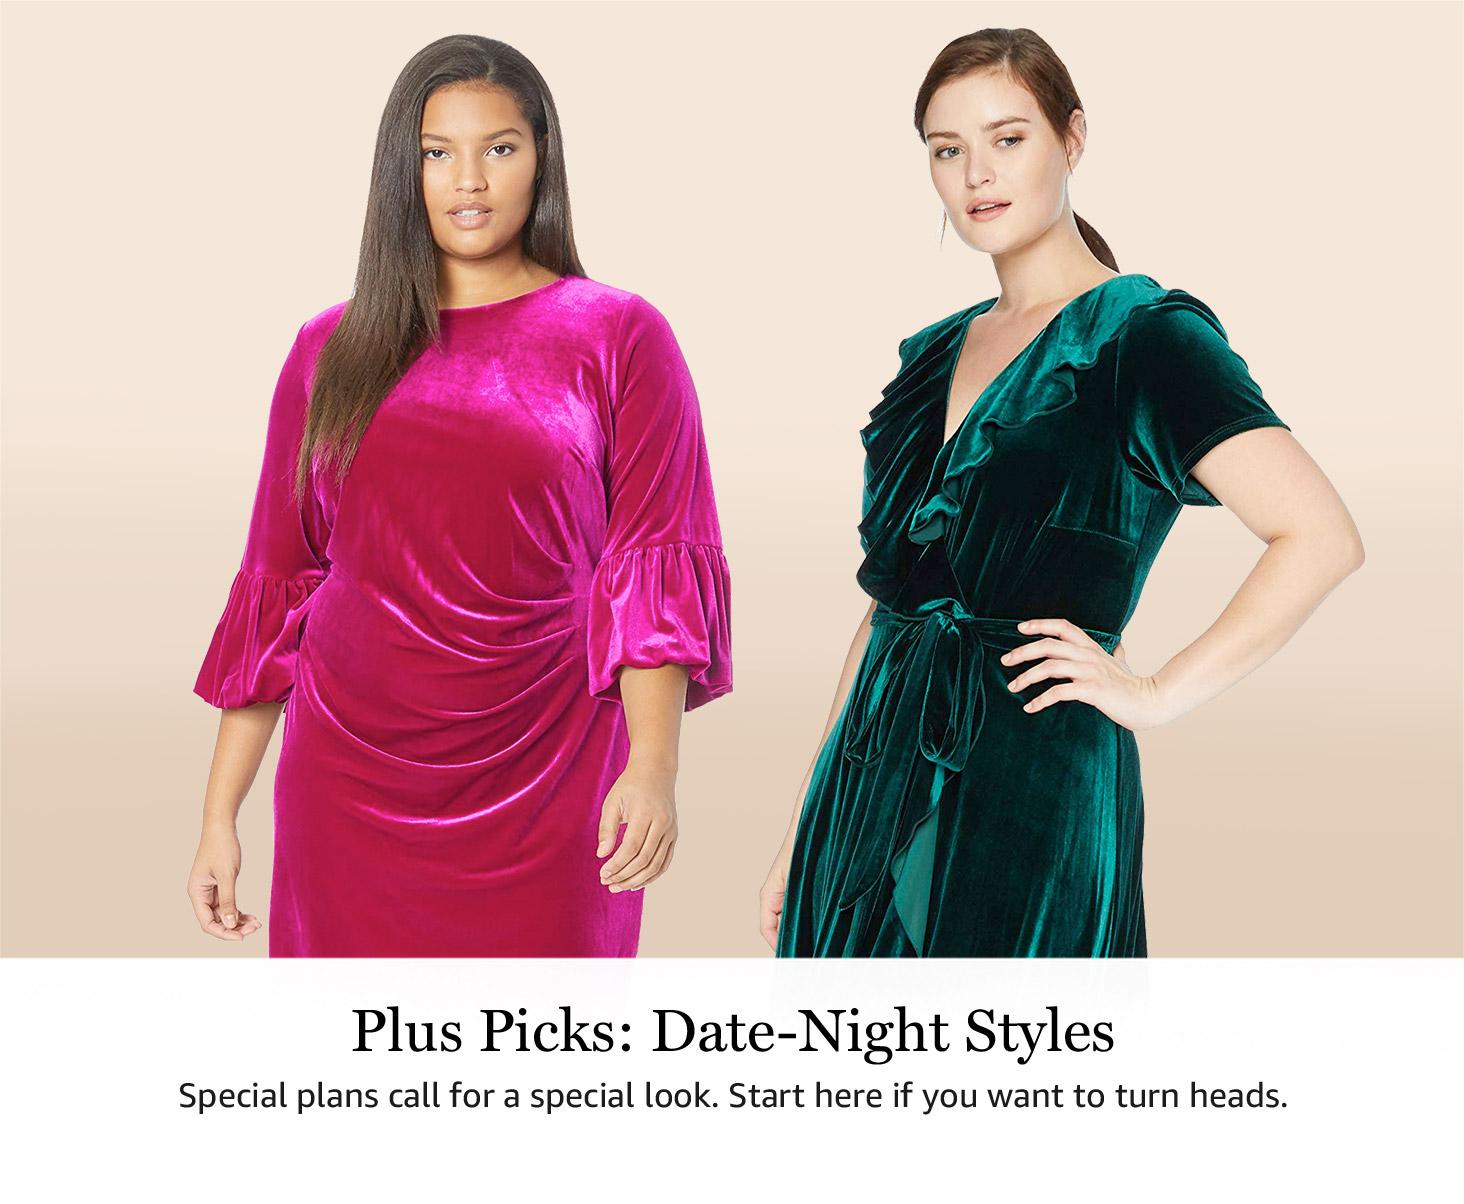 Plus Picks: Date-Night Styles